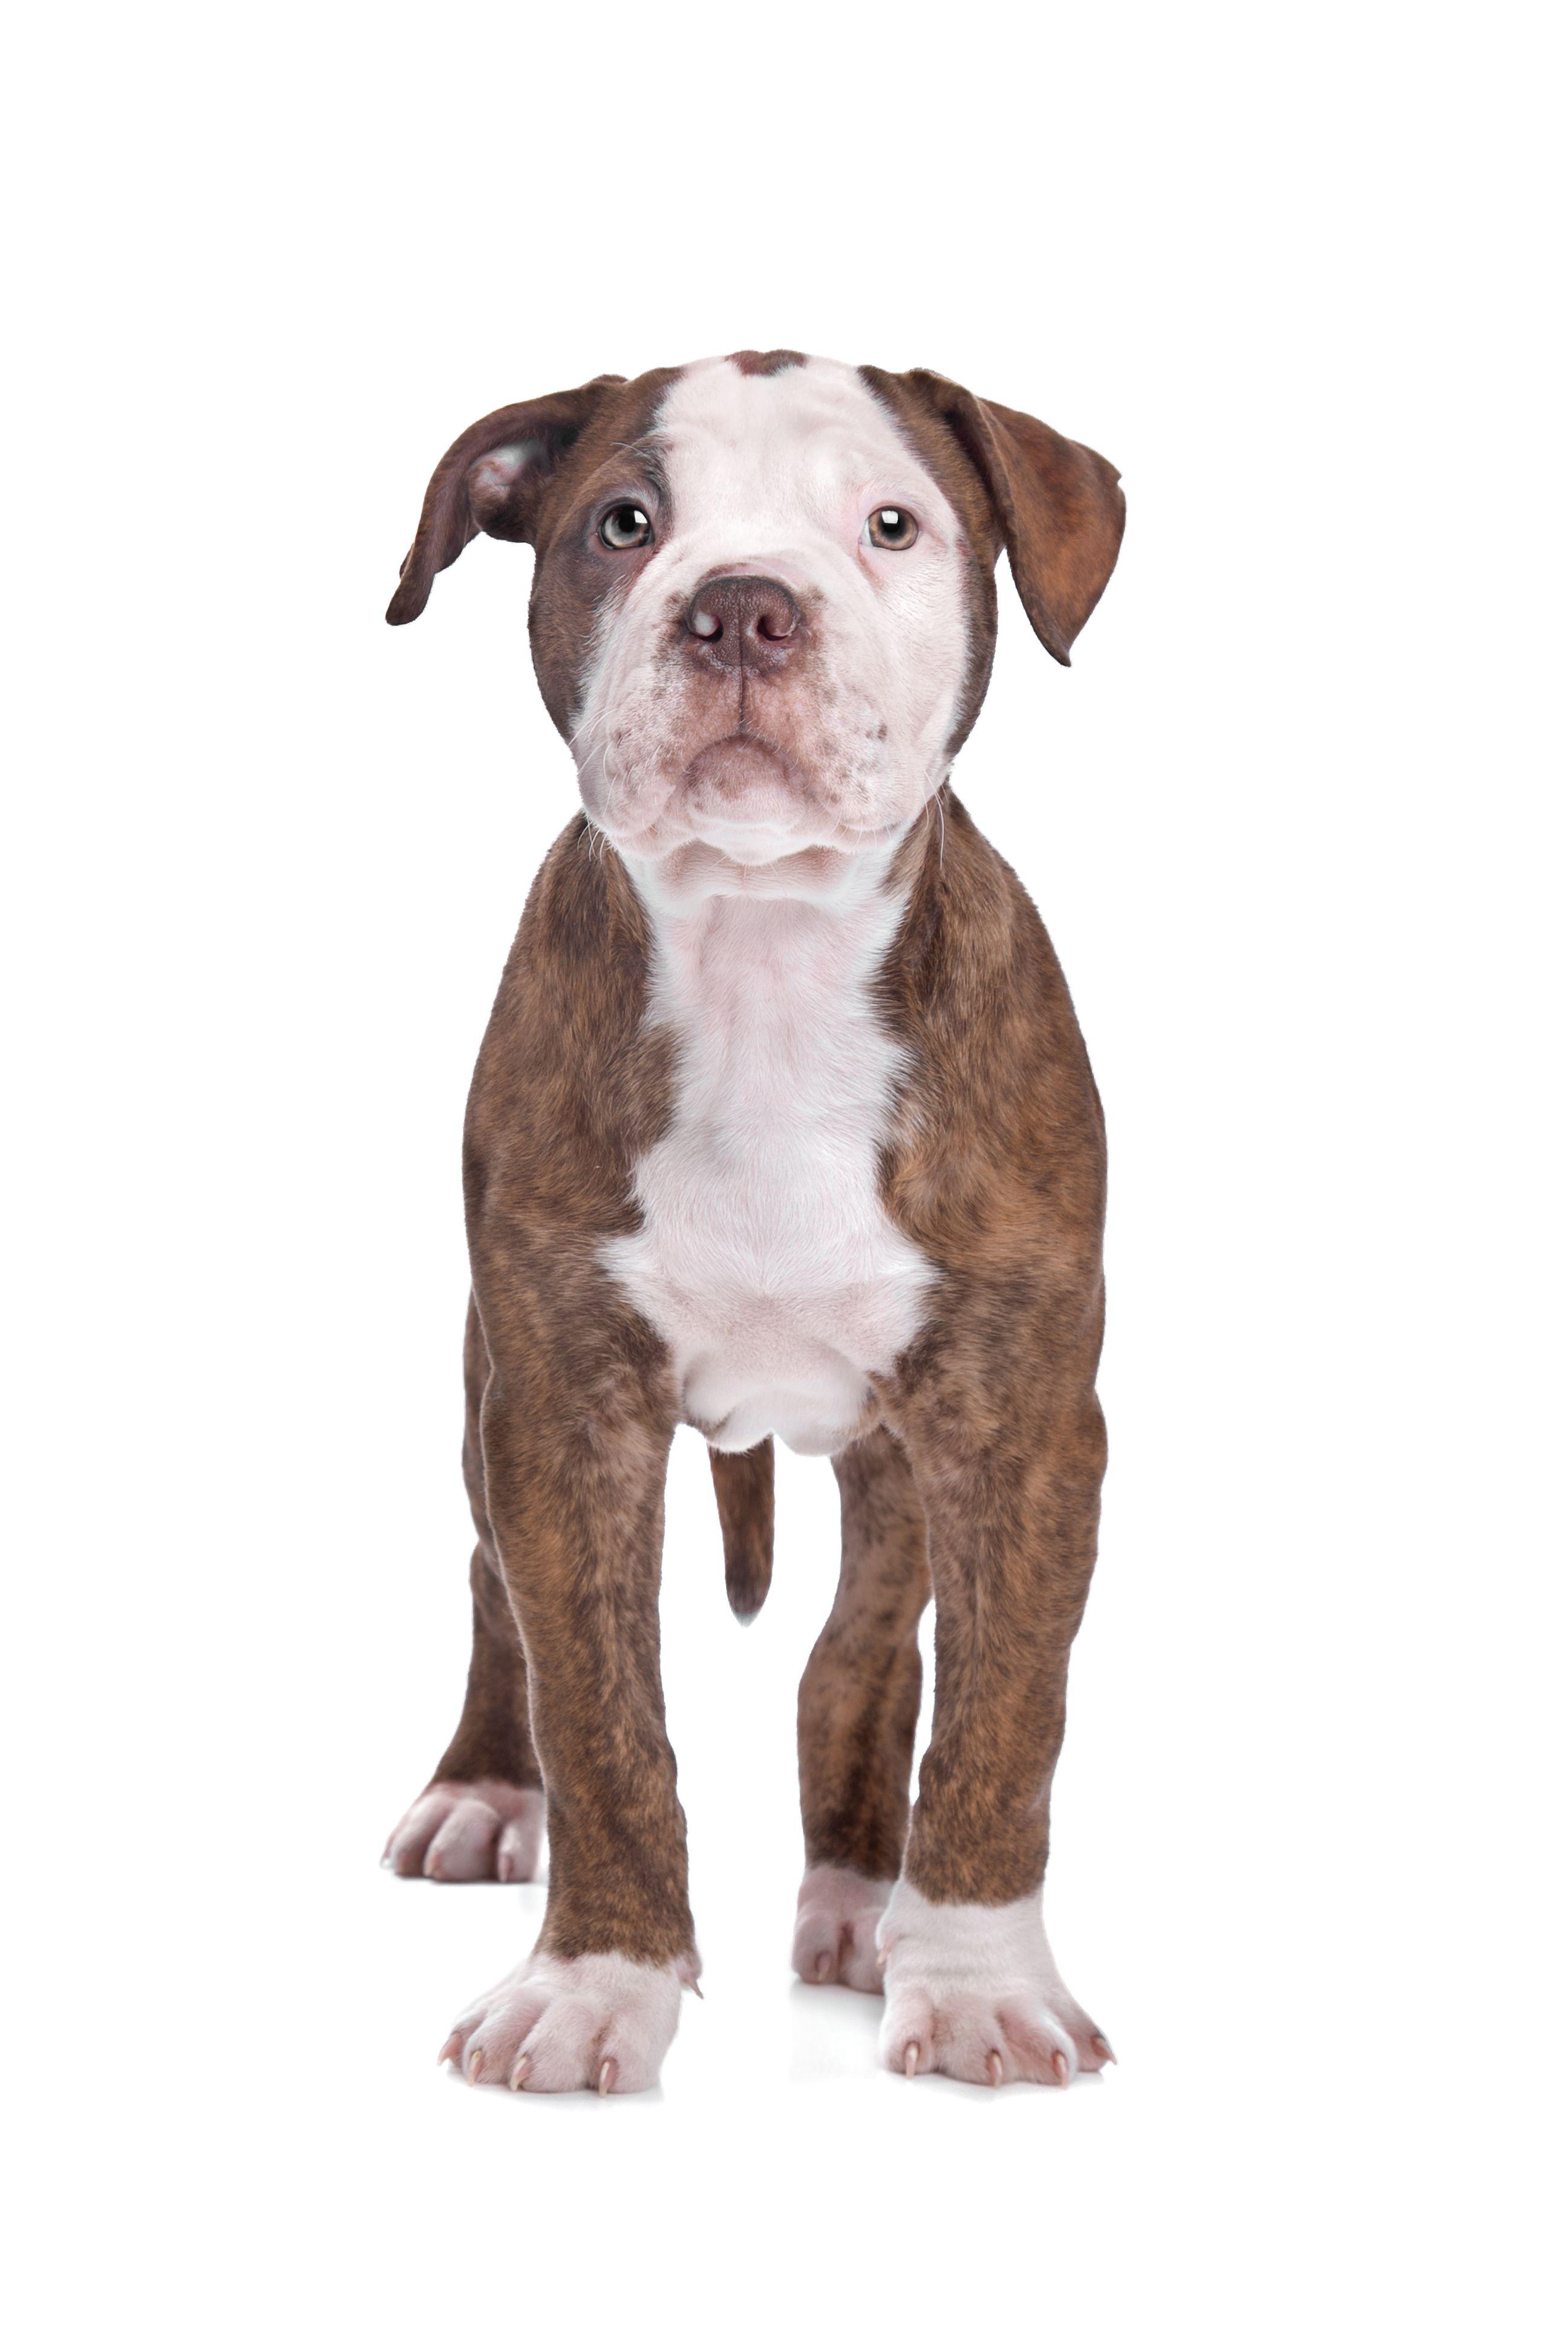 American Bulldog Nose Butter American bulldog